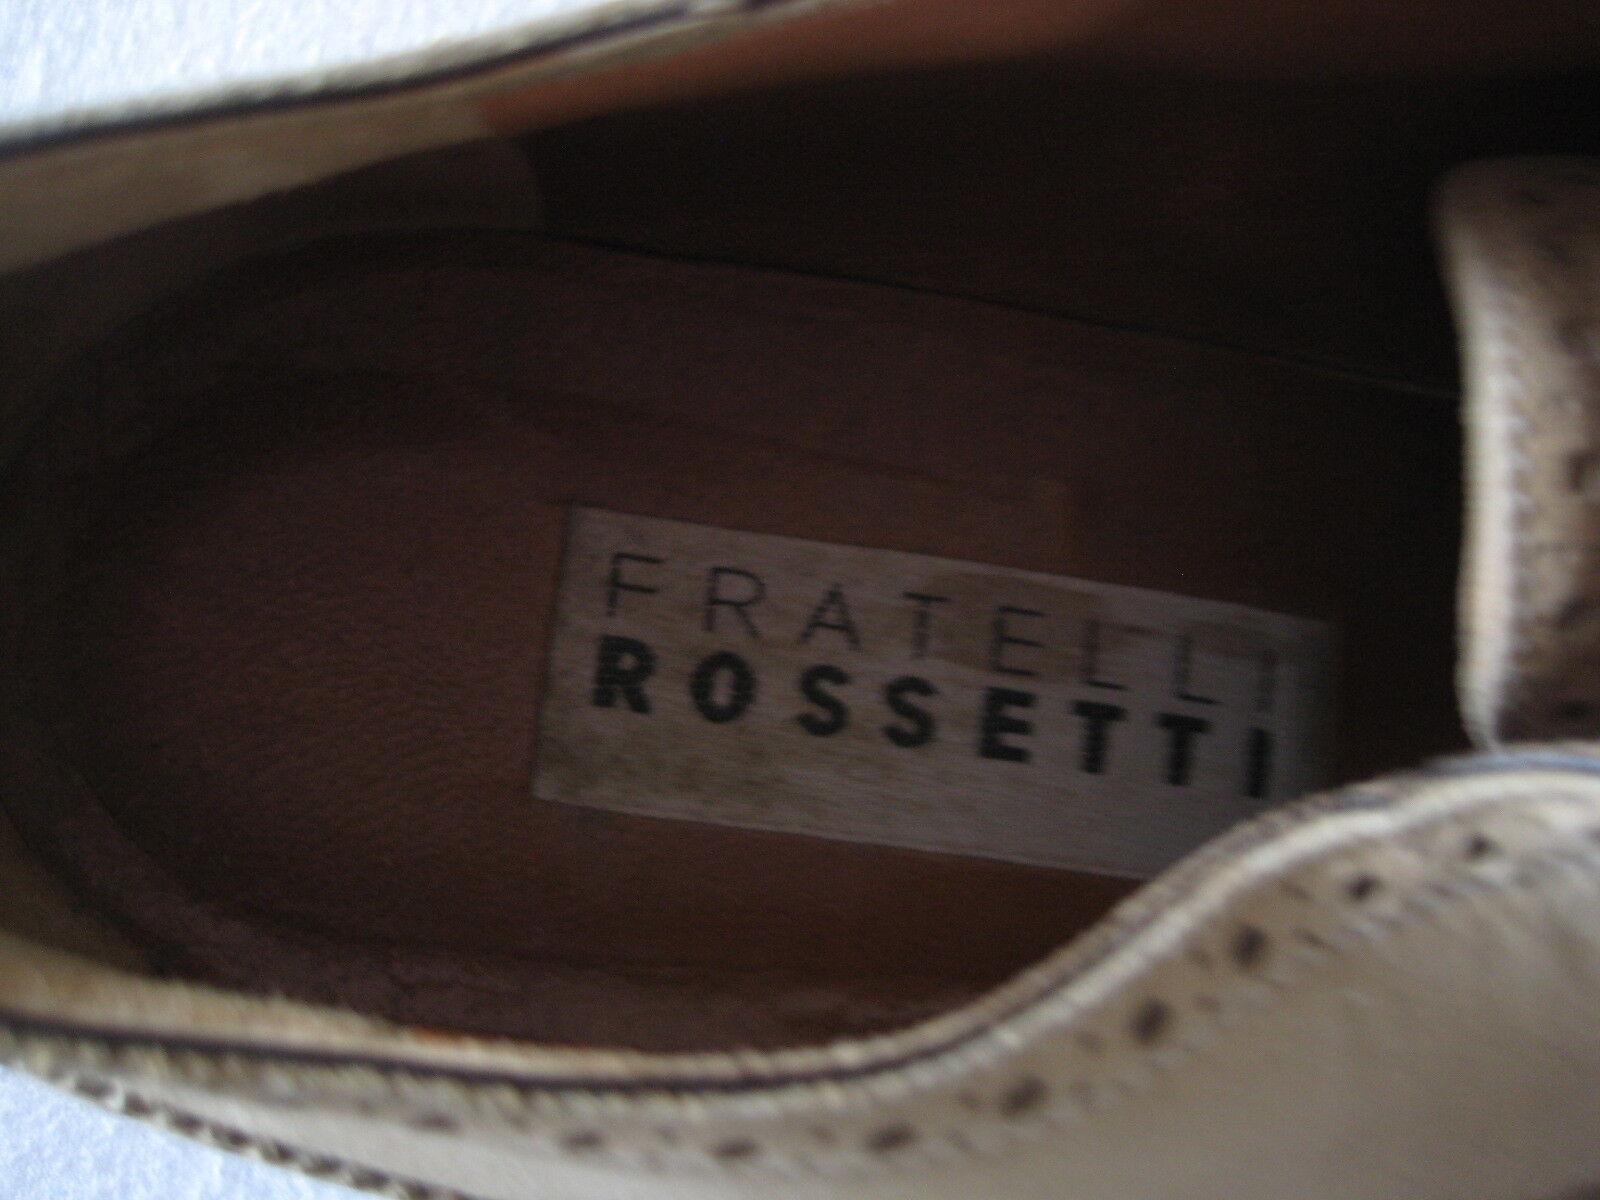 Fratelli Rossetti Rossetti Fratelli vintage sand suede lace-ups, Größe 41 approx. bbfc08